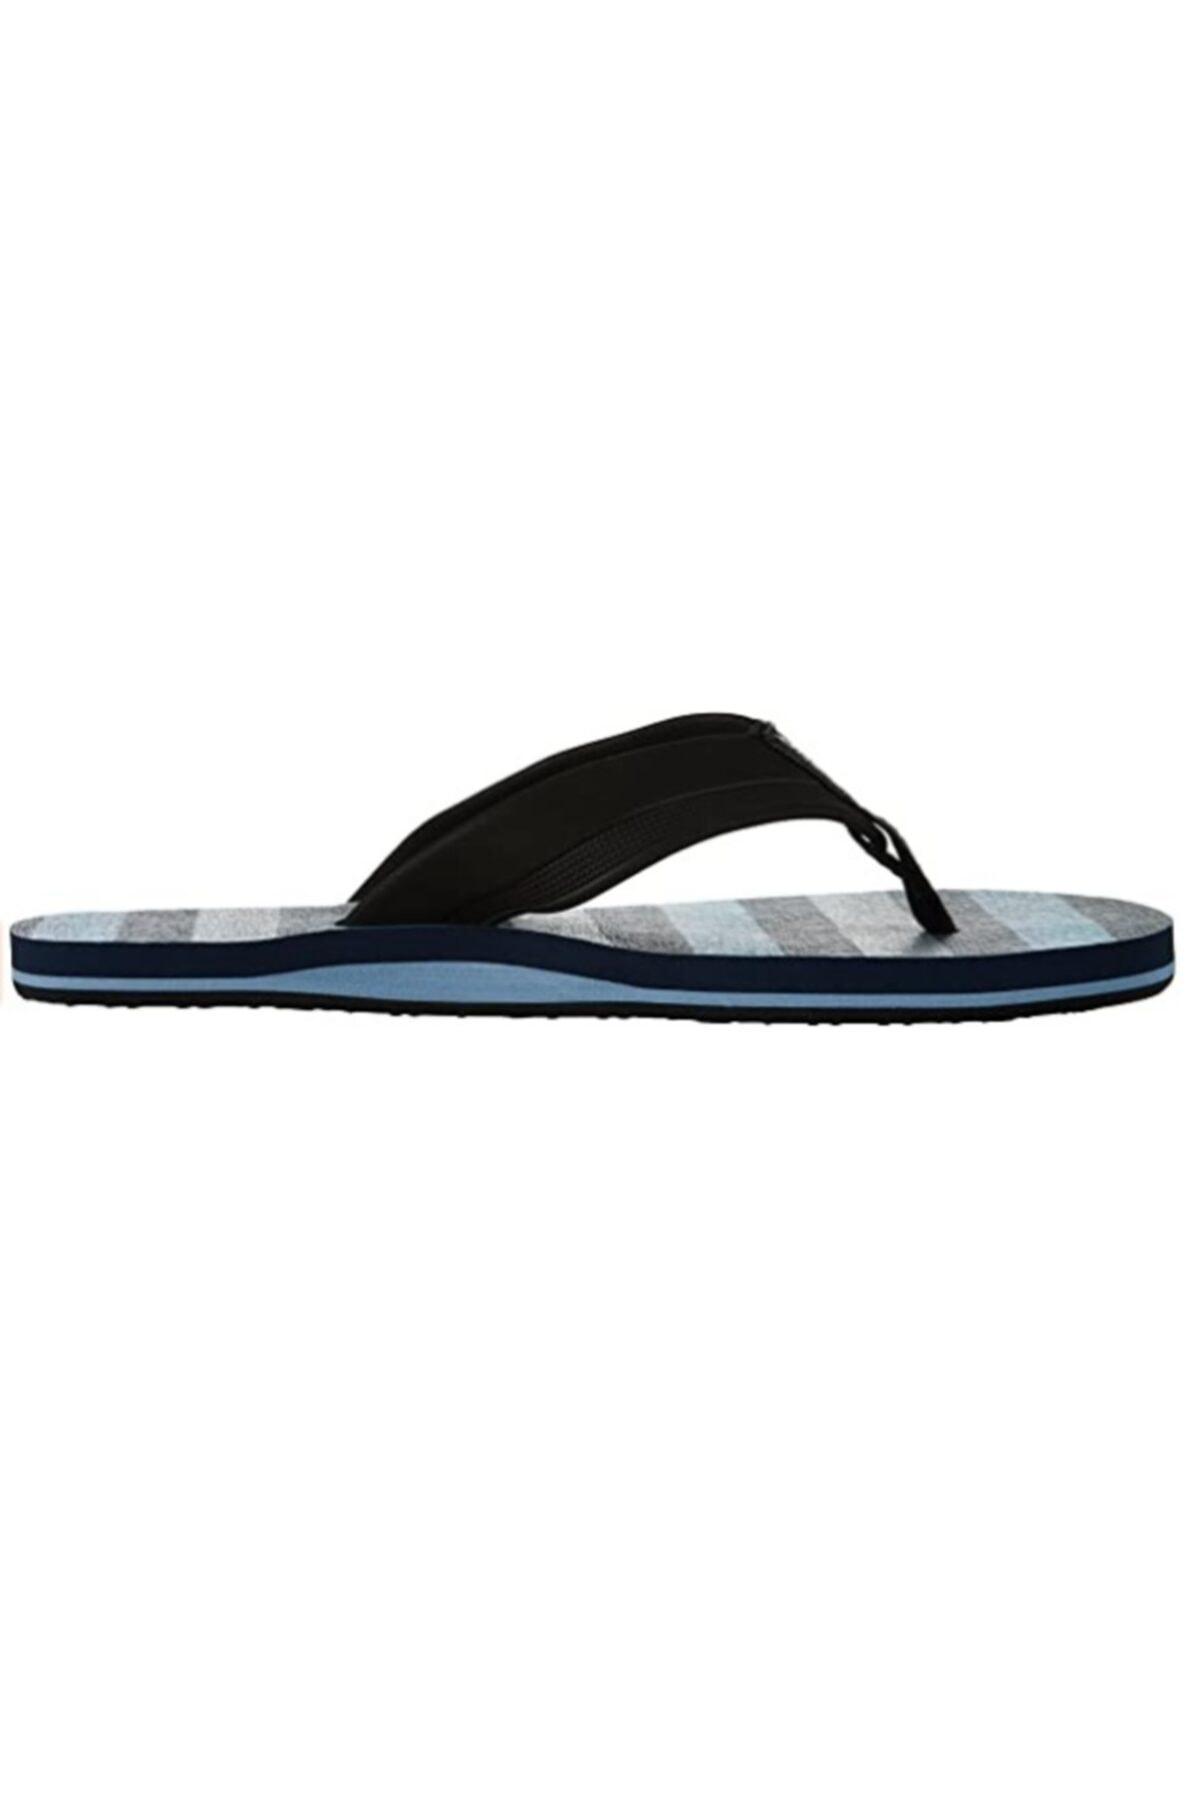 O'Neill Fm Imprint Santa Cruz Flip Flop Blue Aop,black 7a4524 1